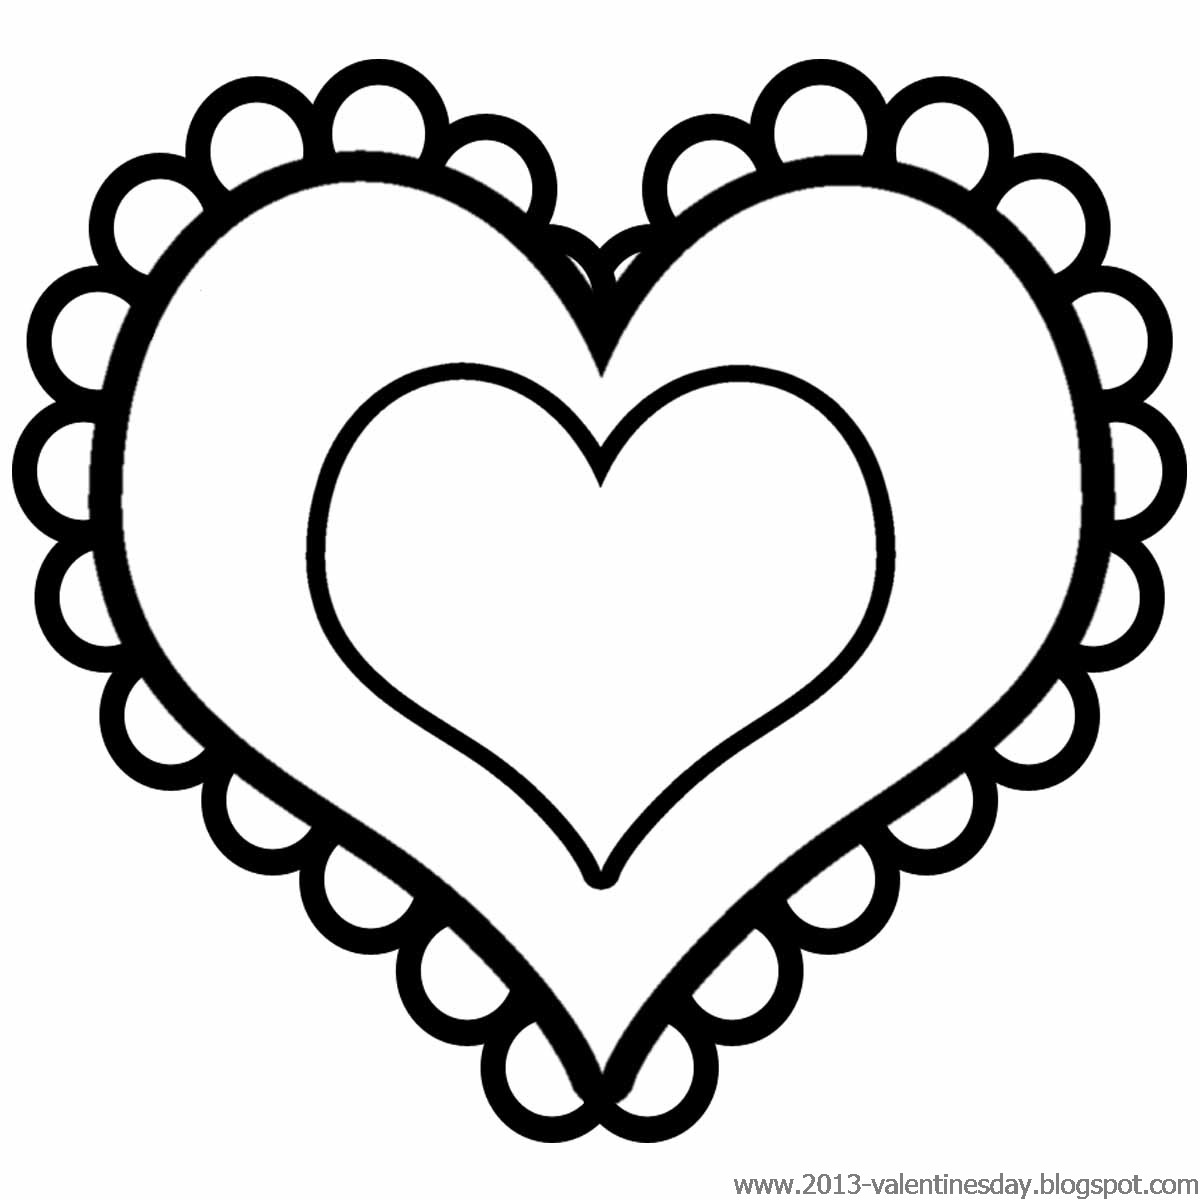 Heart Vector Black And White Heart Clip -Heart Vector Black And White Heart Clip Art-11